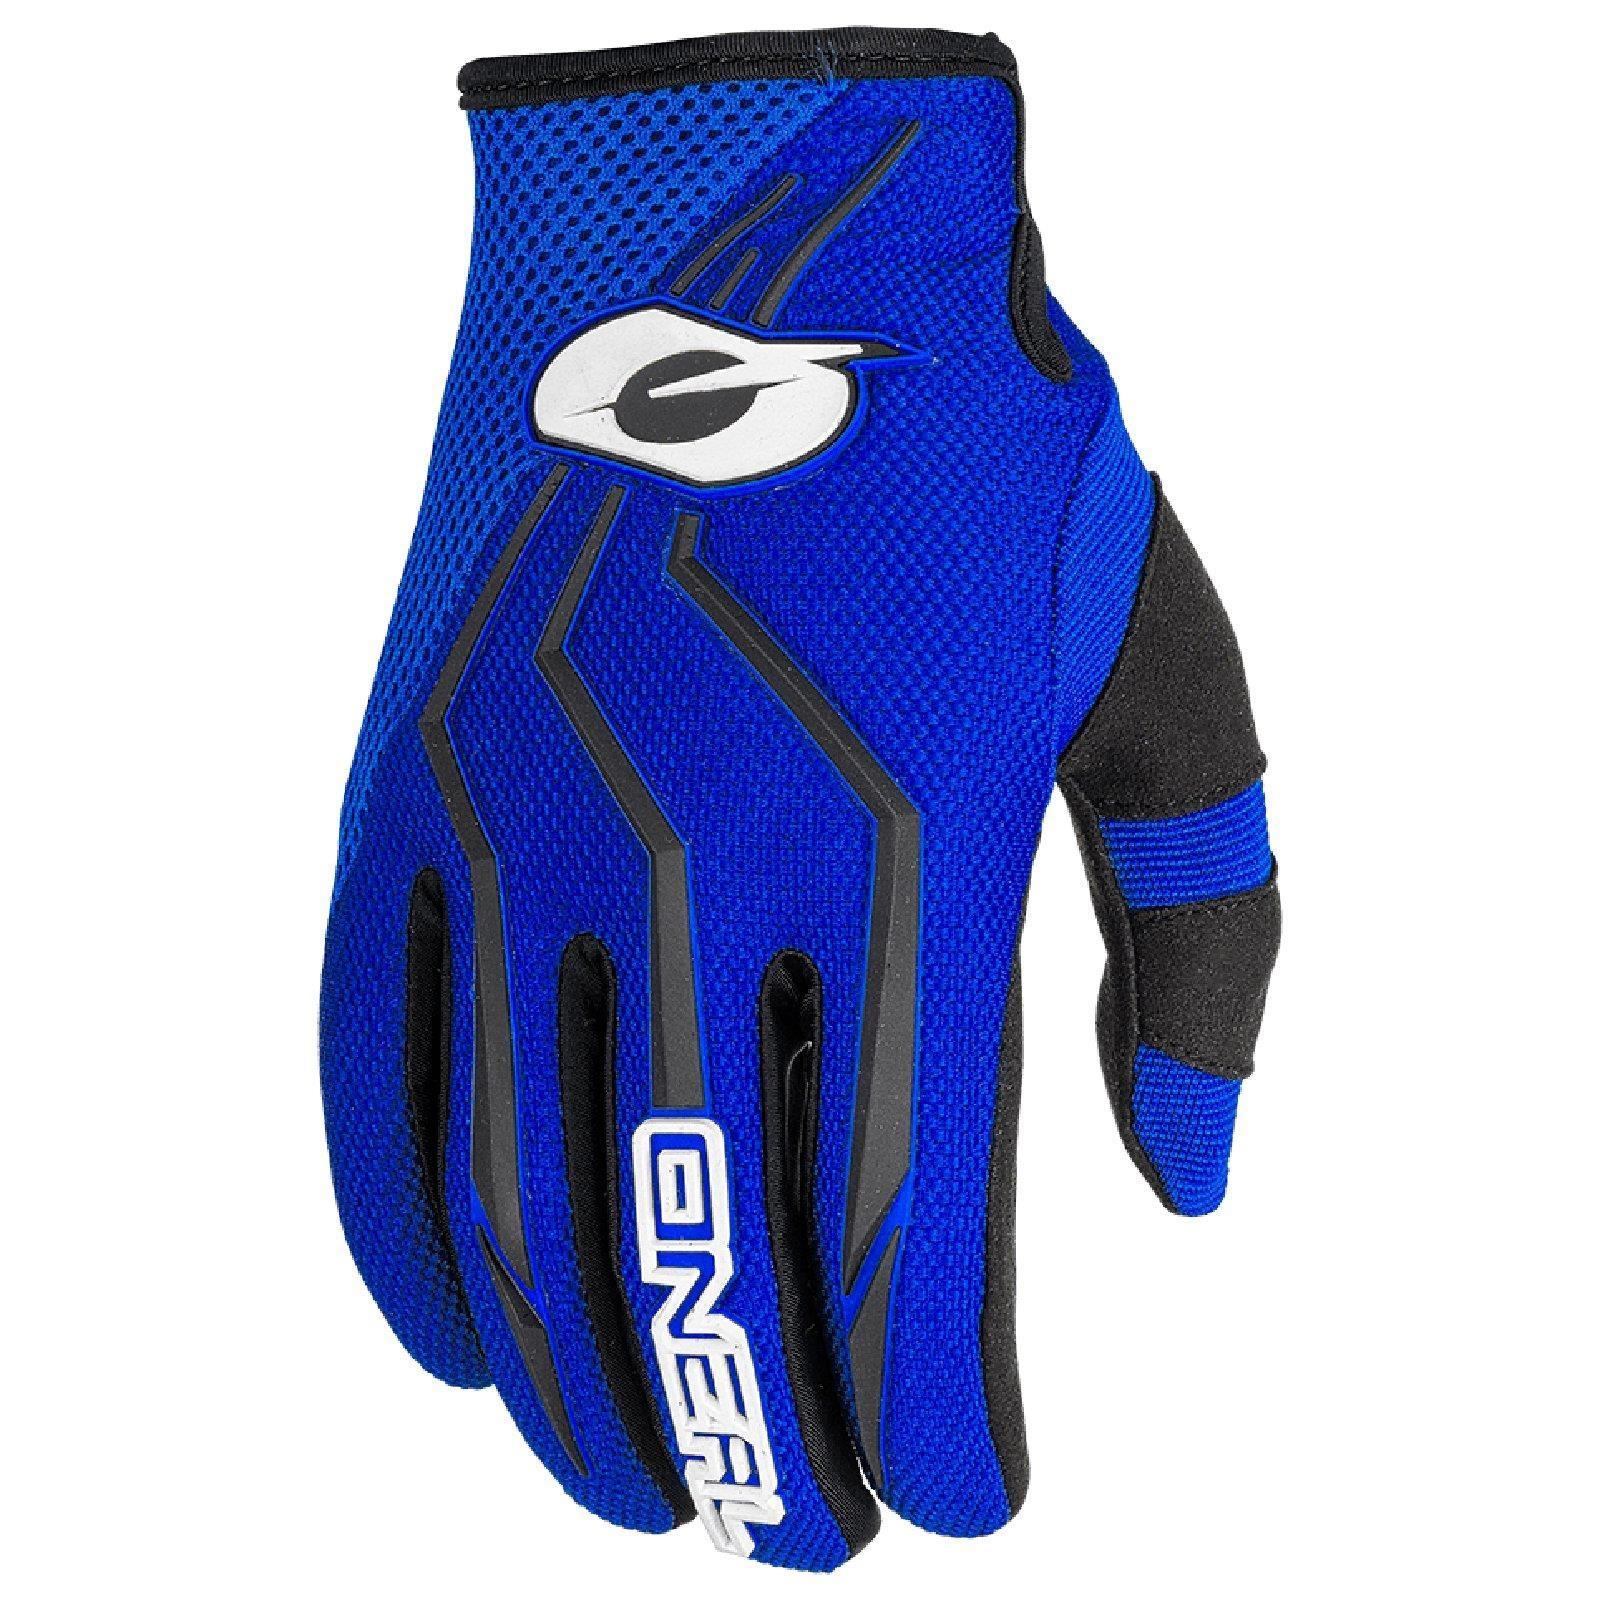 ONEAL-Element-MX-Guanti-MOTO-CROSS-DH-DOWNHILL-ENDURO-Mountainbike-MTB-QUAD miniatura 10